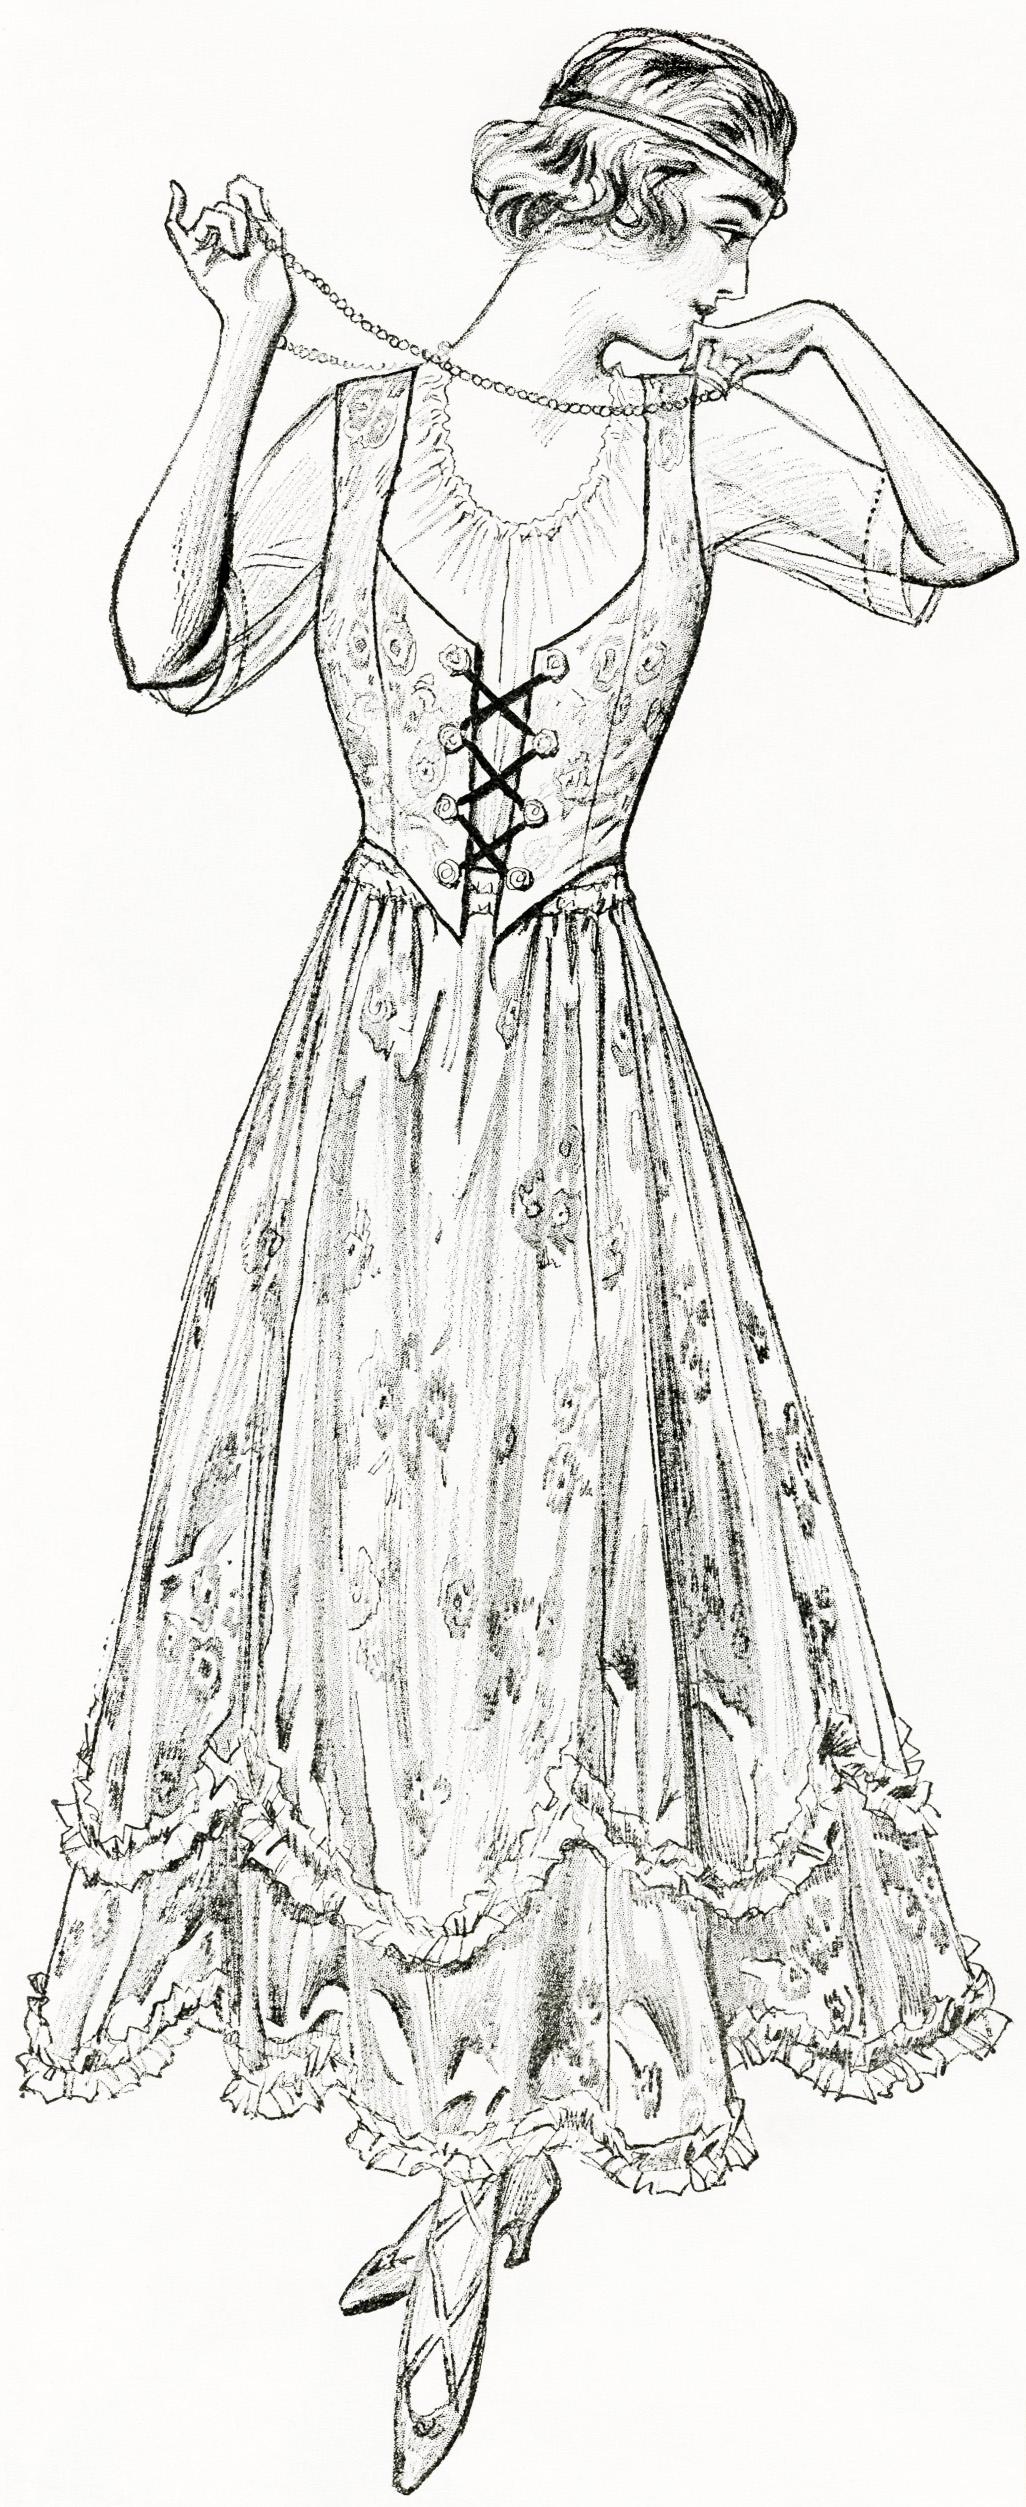 Free Digital Image New Summer Dress For